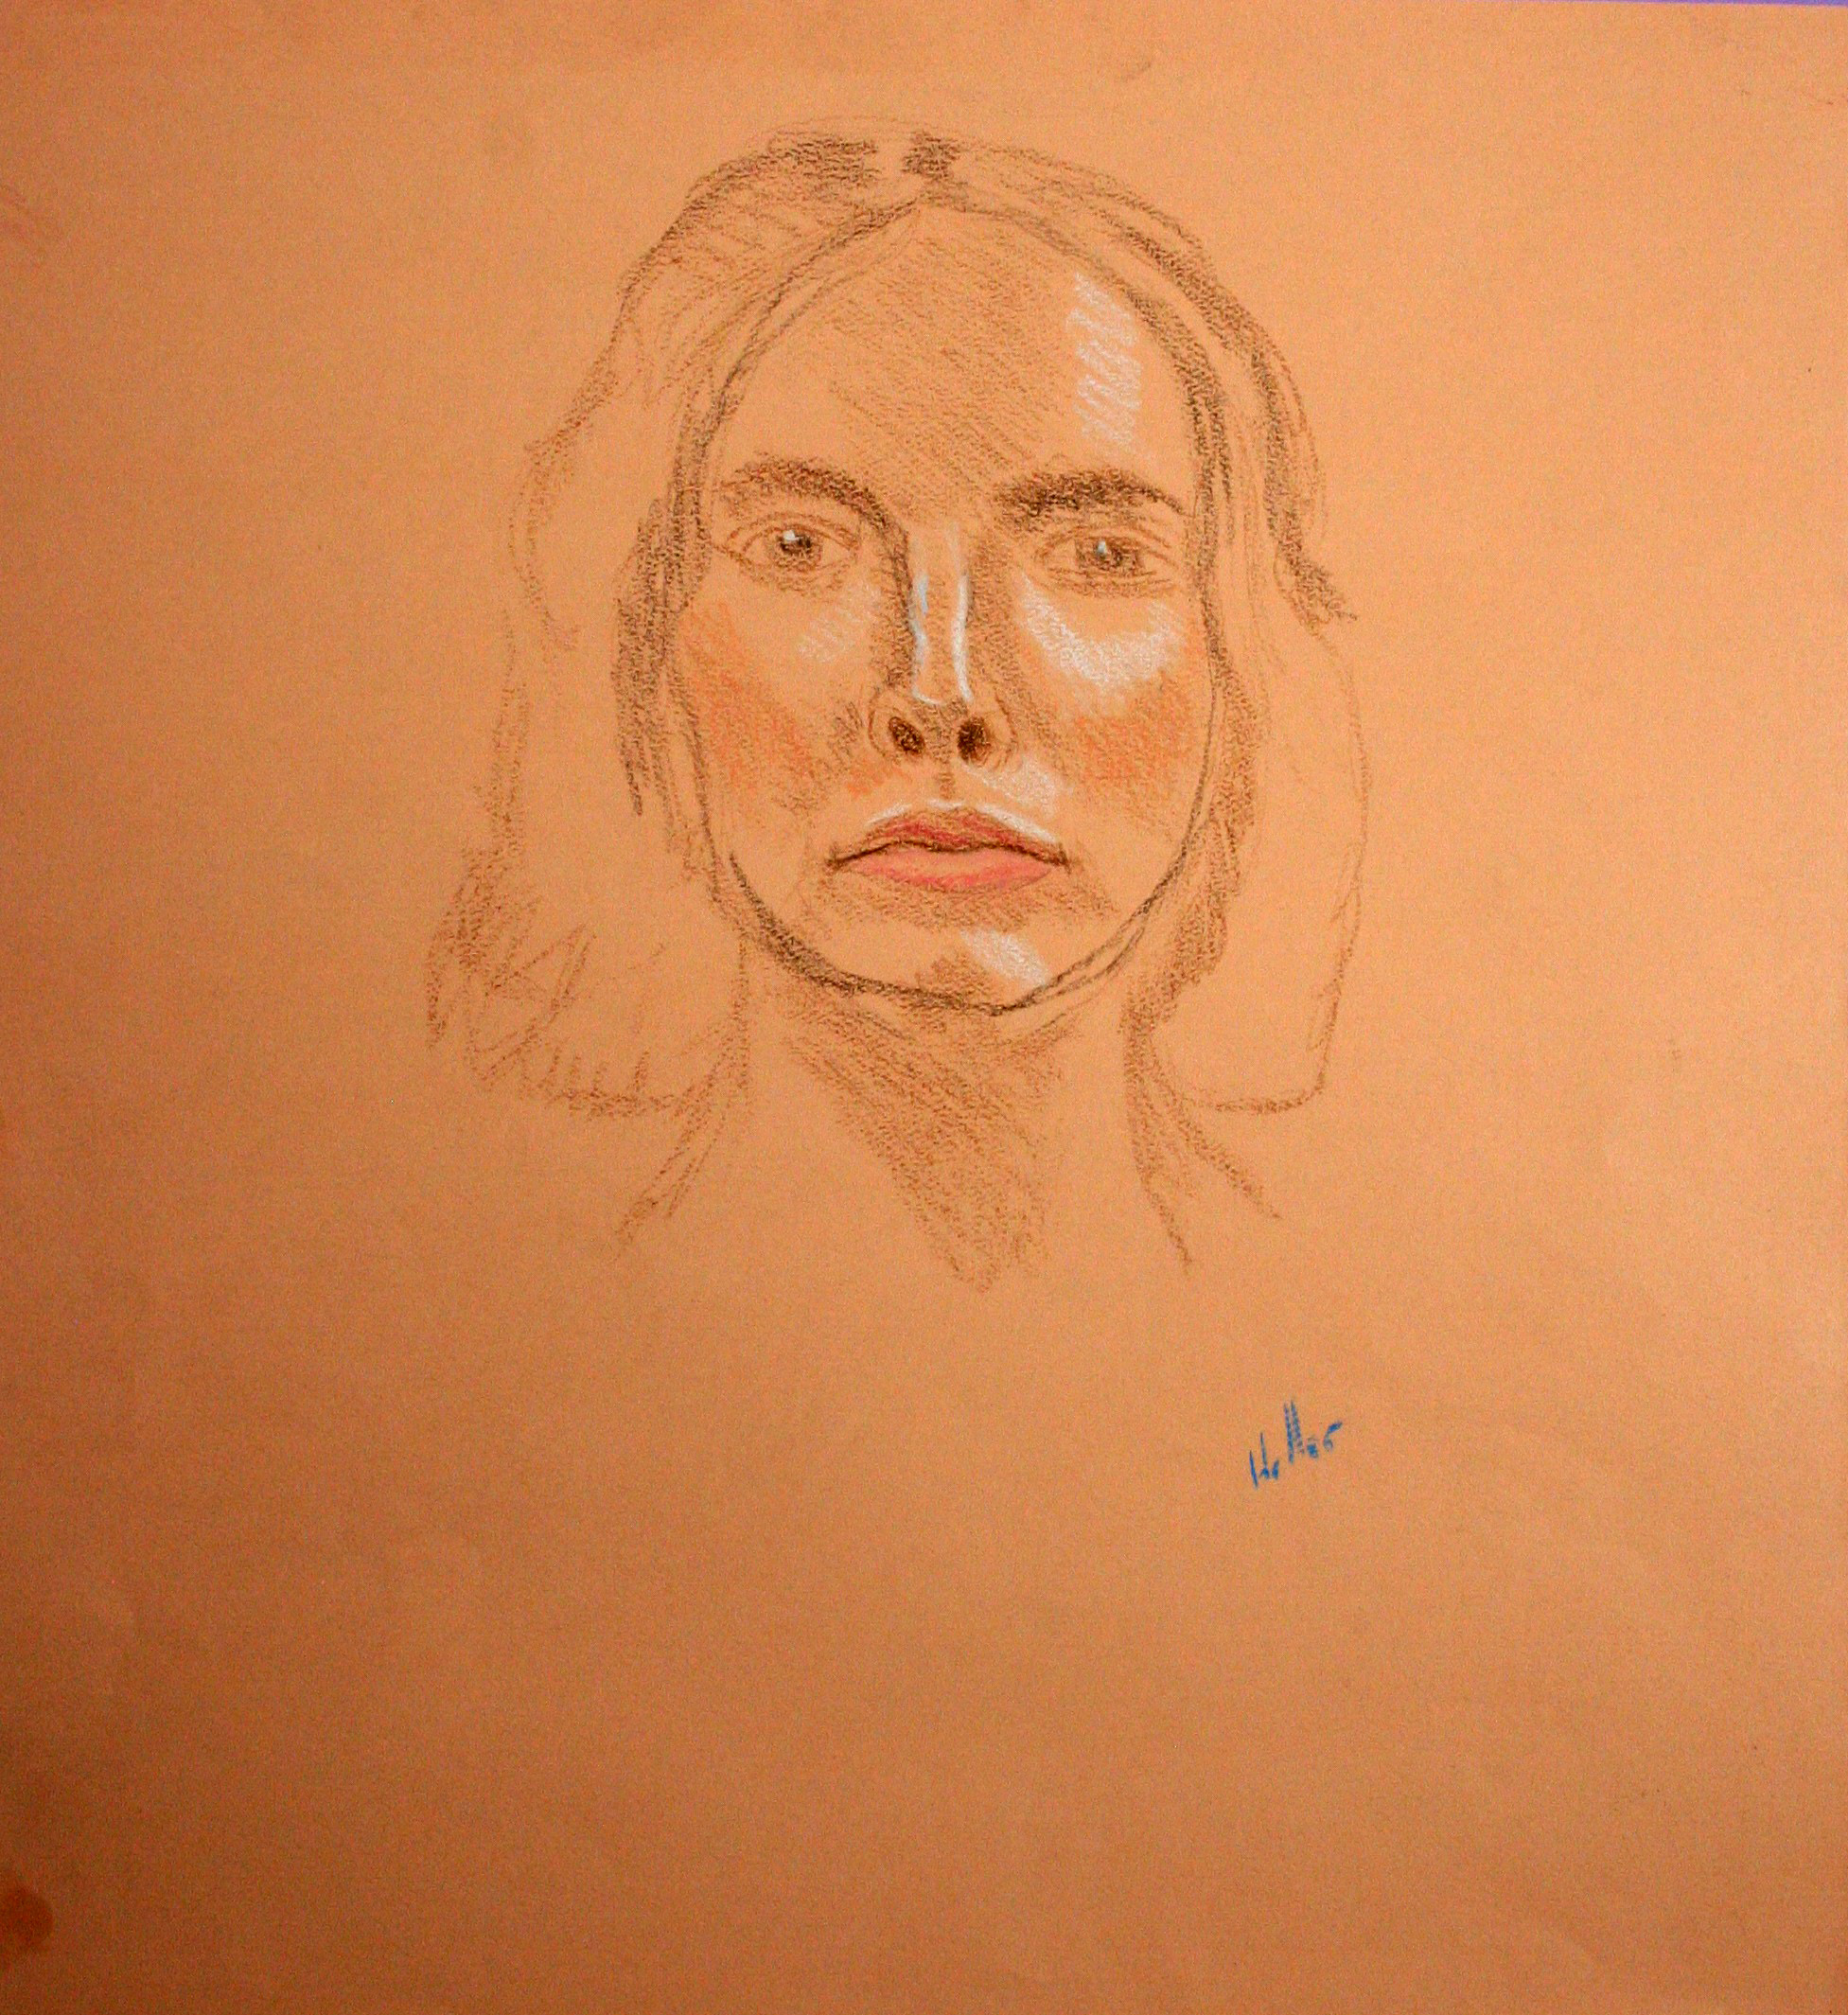 David Heller - Pencil